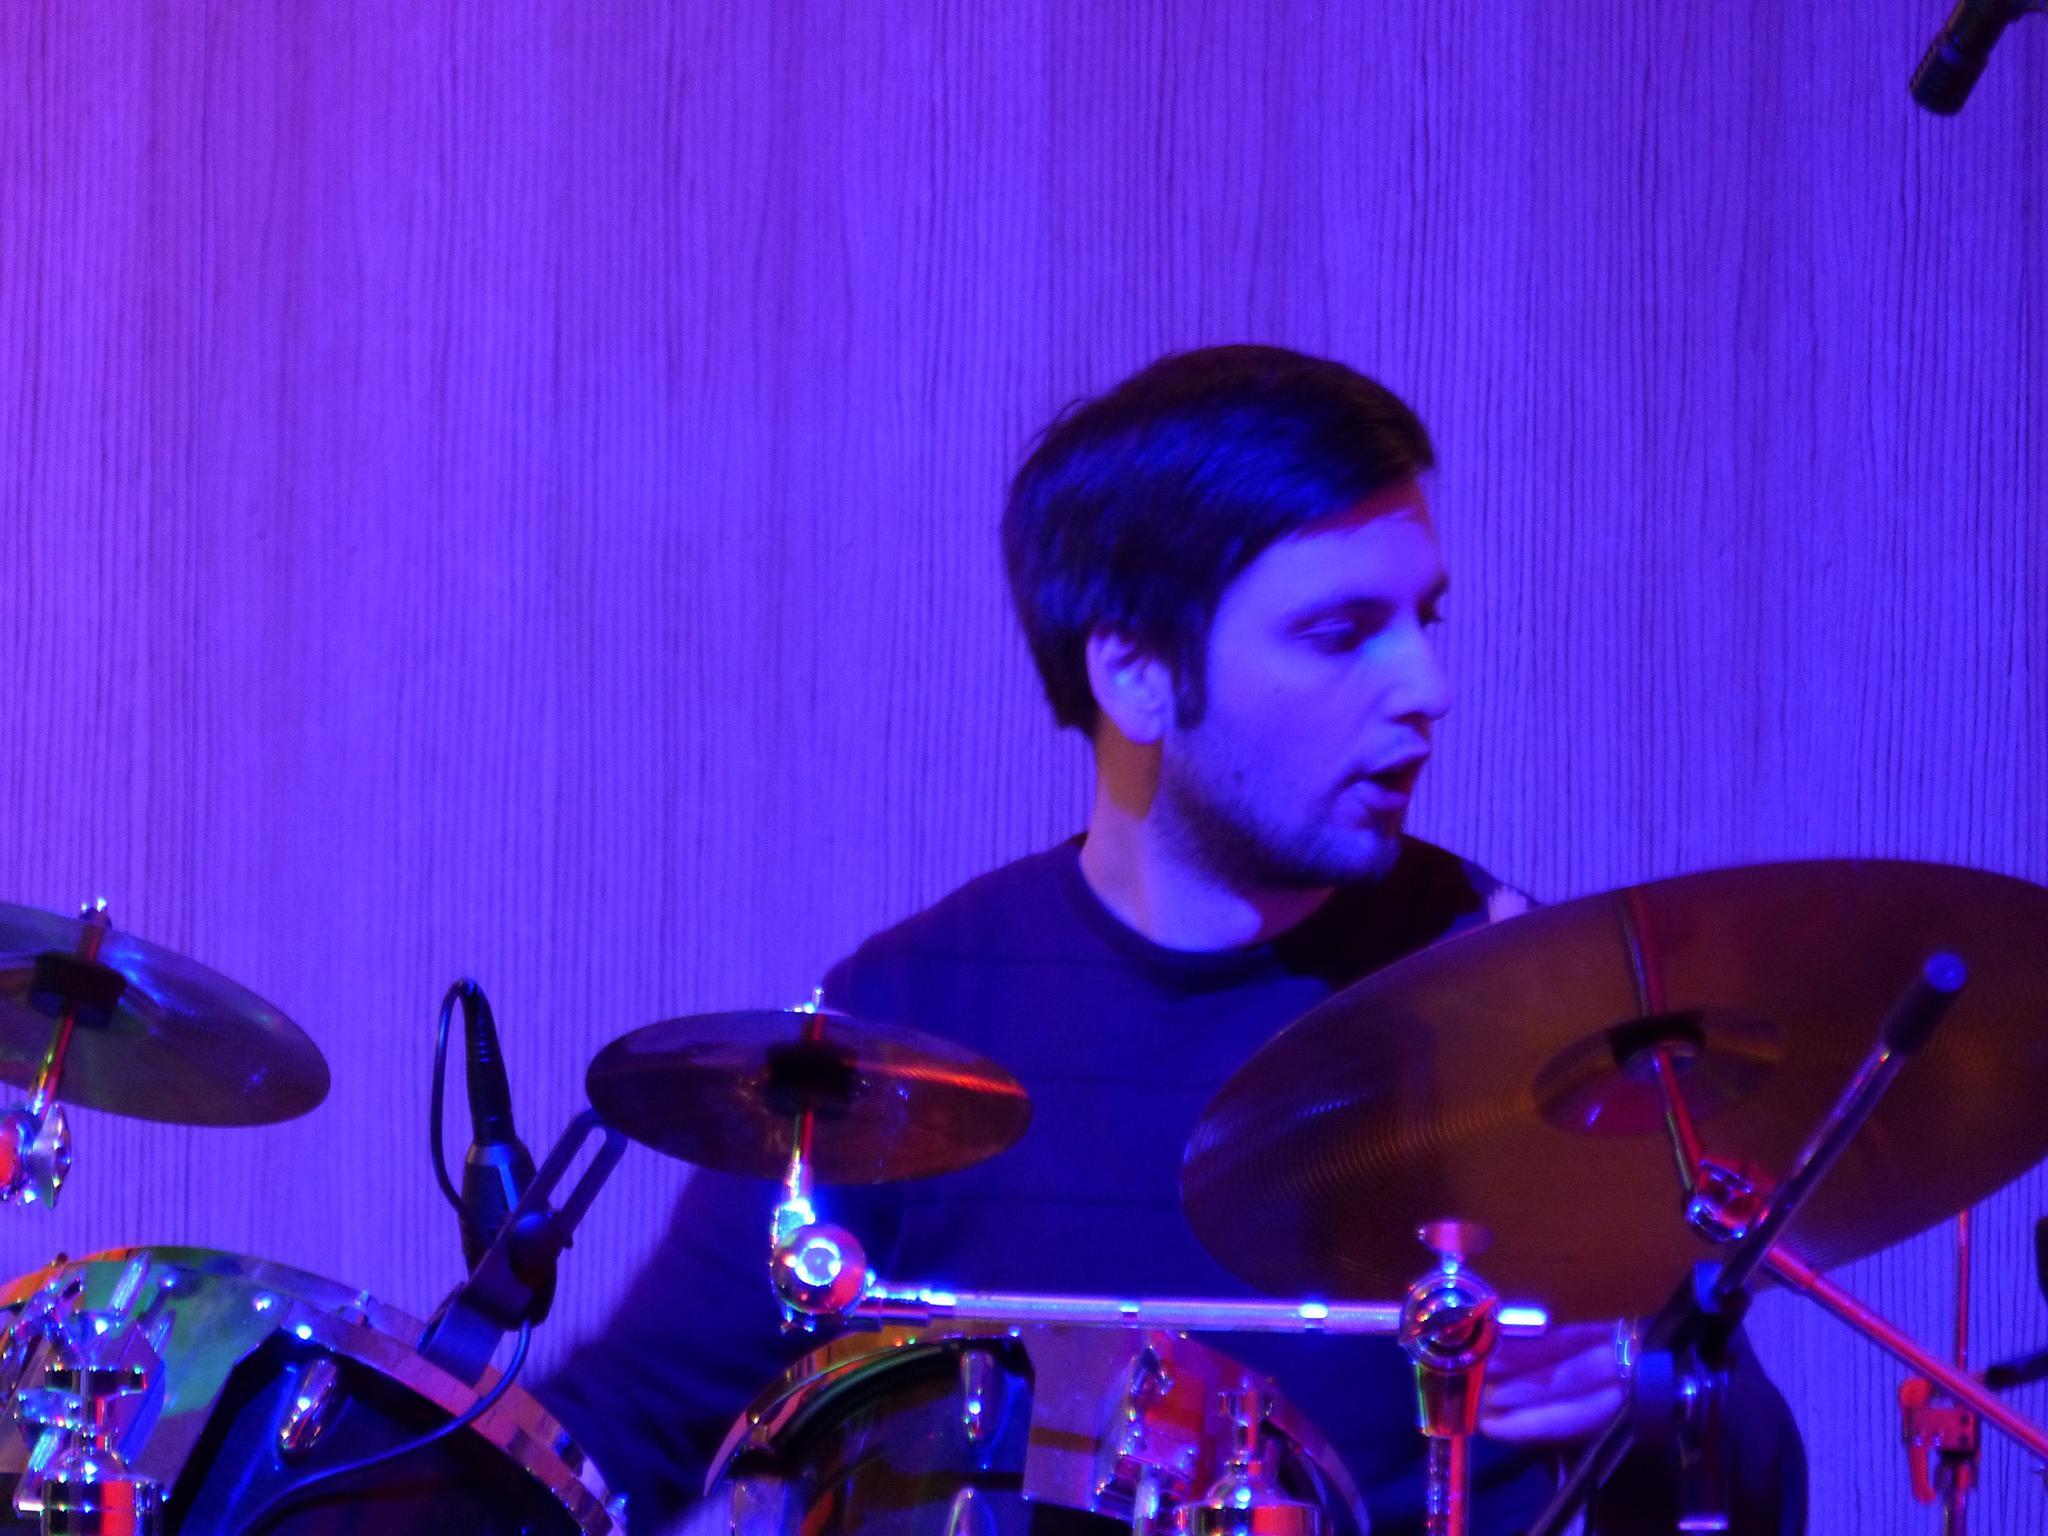 Der Schlagzeuger gibt den Takt an